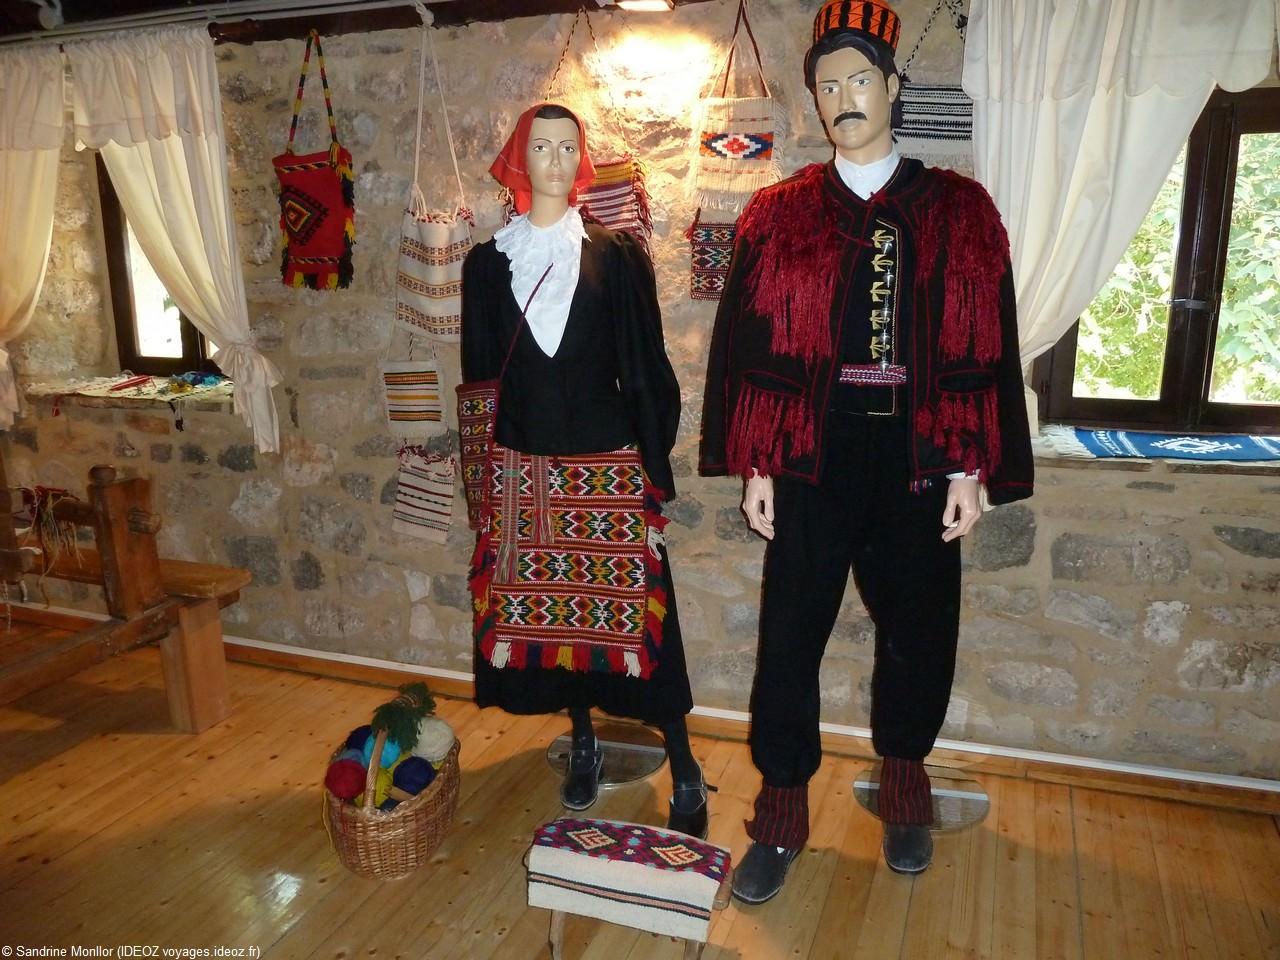 Ethnomusée de Krka Costumes traditionnels traditionnels dalmates